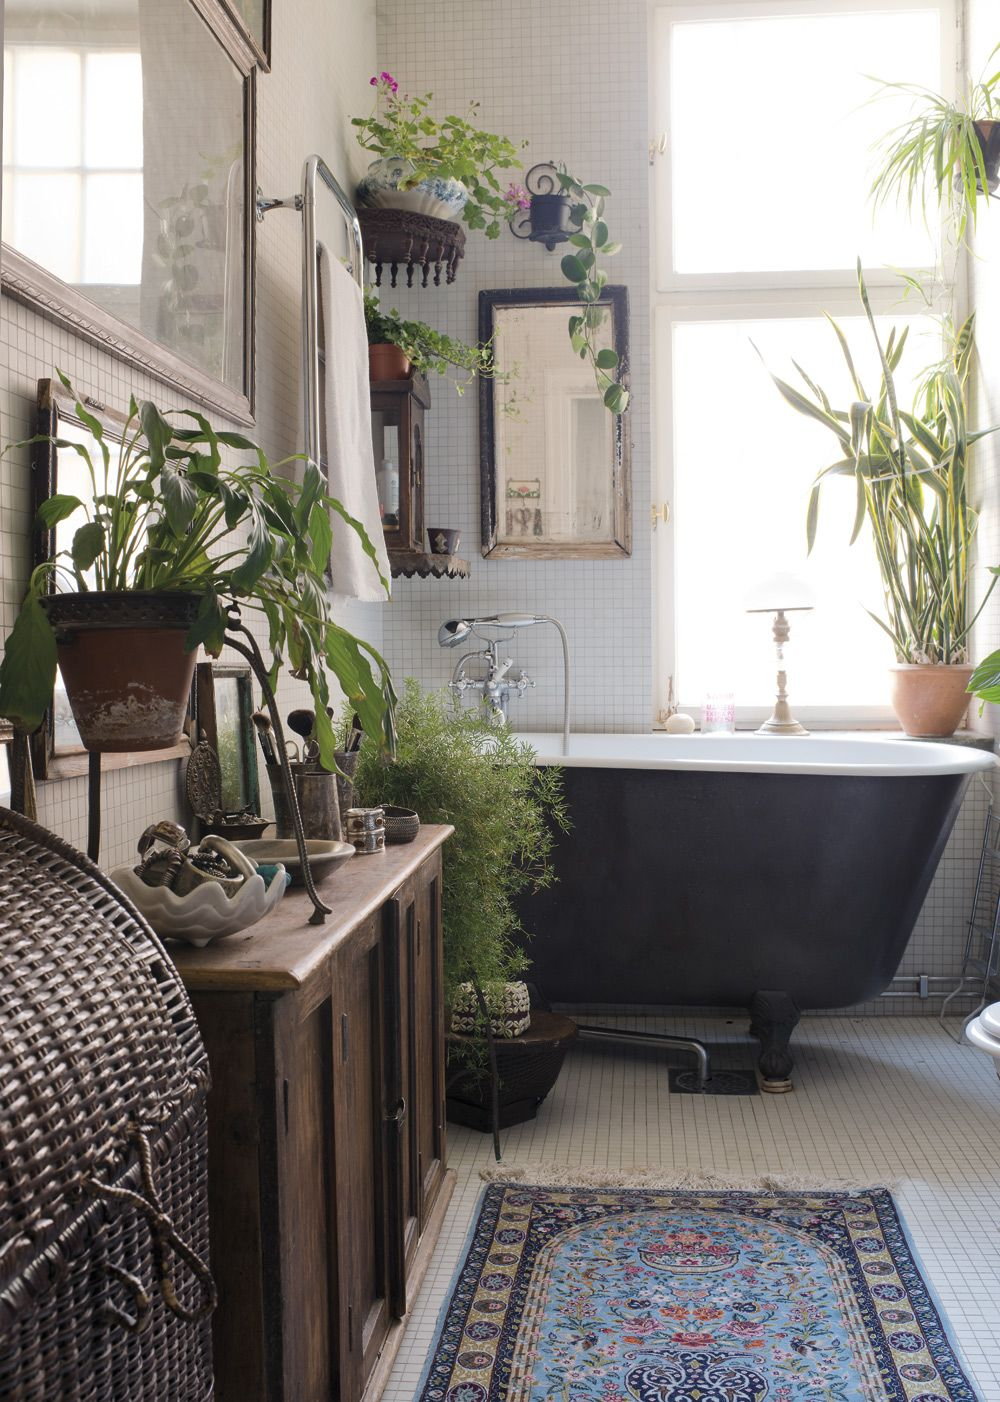 Badezimmer design natur inspiriert inspiration add a touch of bohemian to your home  bohemian